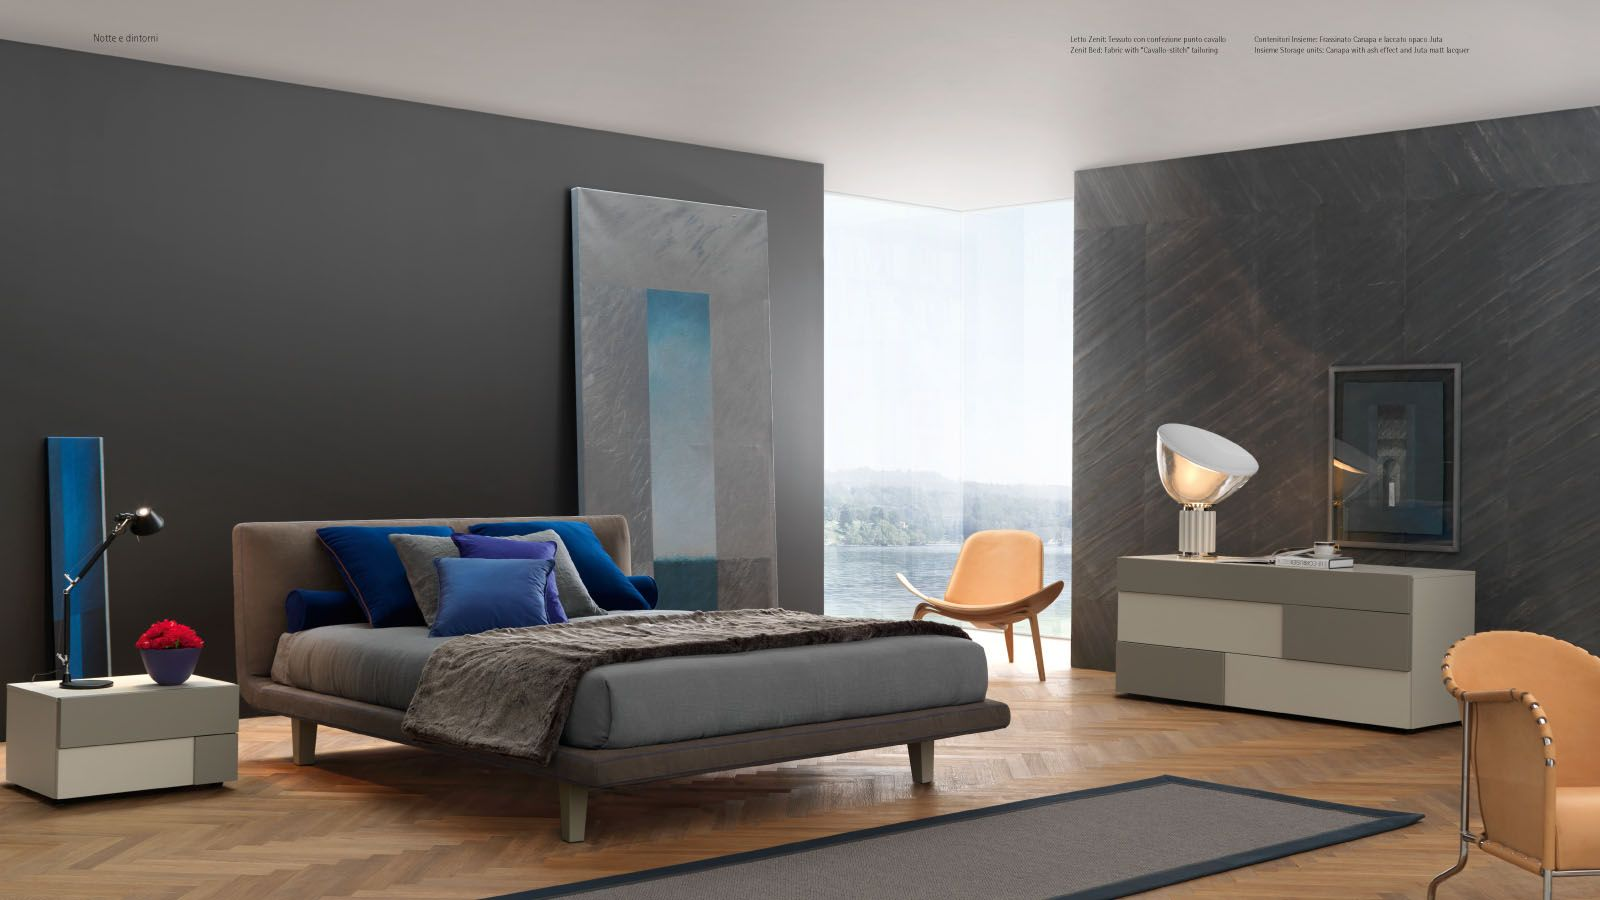 camera da letto san giacomo - Cerca con Google | camera da letto ...